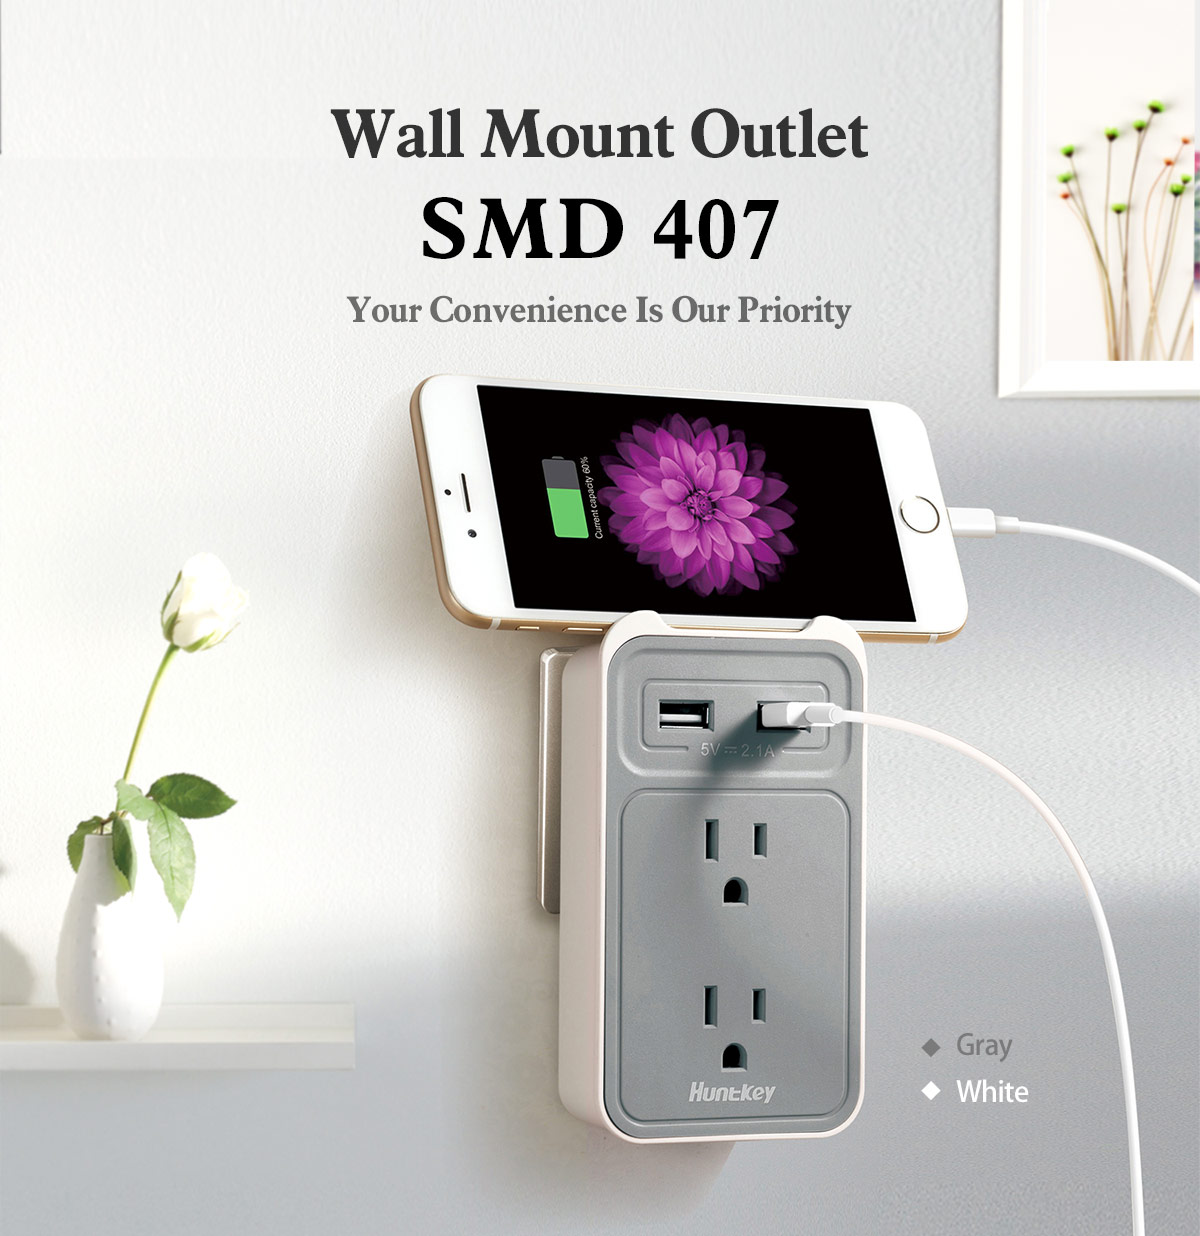 SMD407_1 SMD407(Gray)